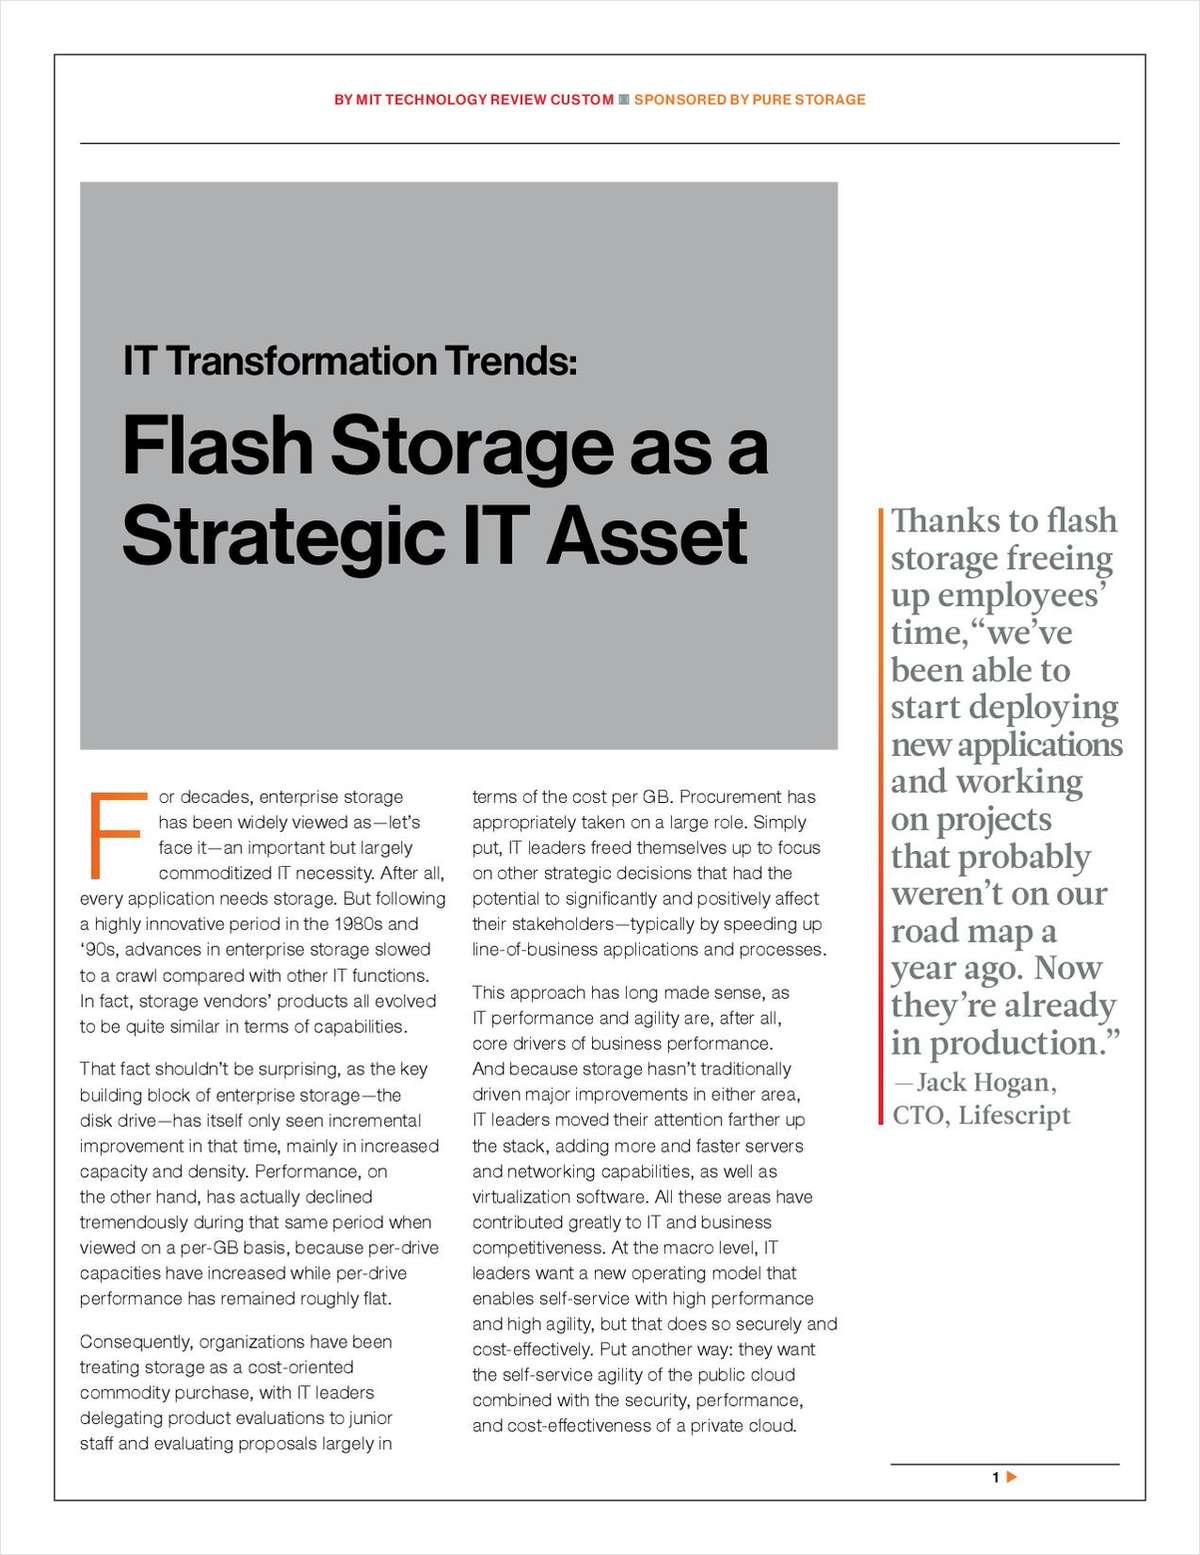 MIT Technology Review: Flash Storage As a Strategic IT Asset